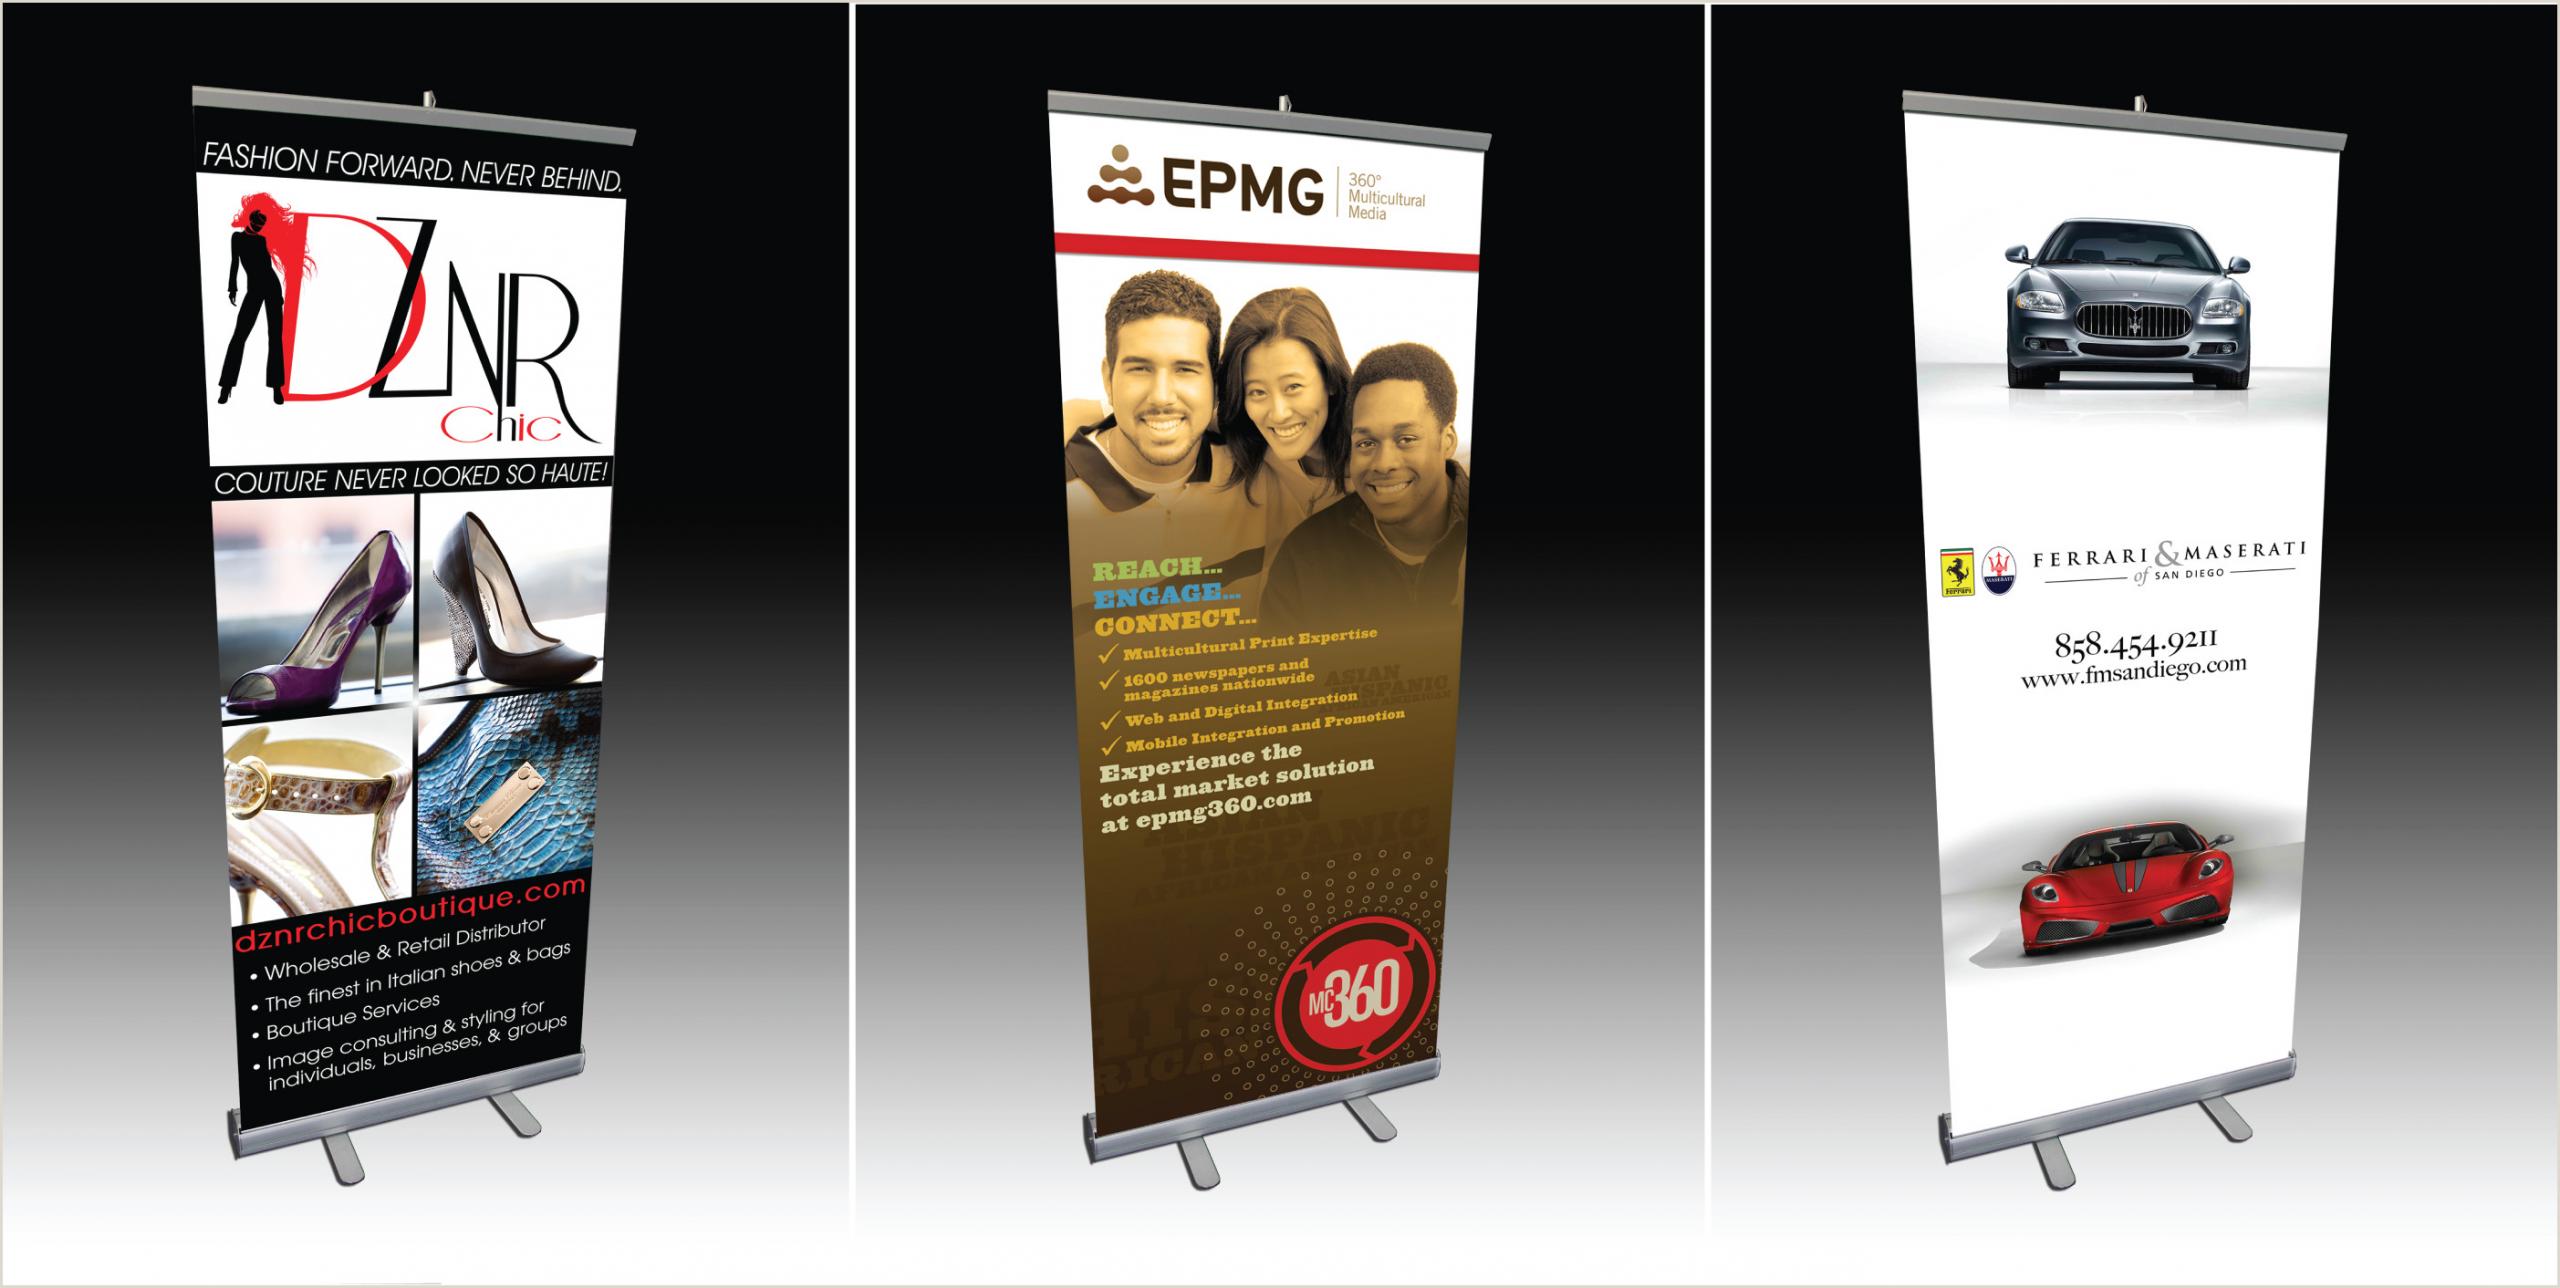 Large Banner Sizes Poster Printing In Santa Rosa Ca Fedex Poster